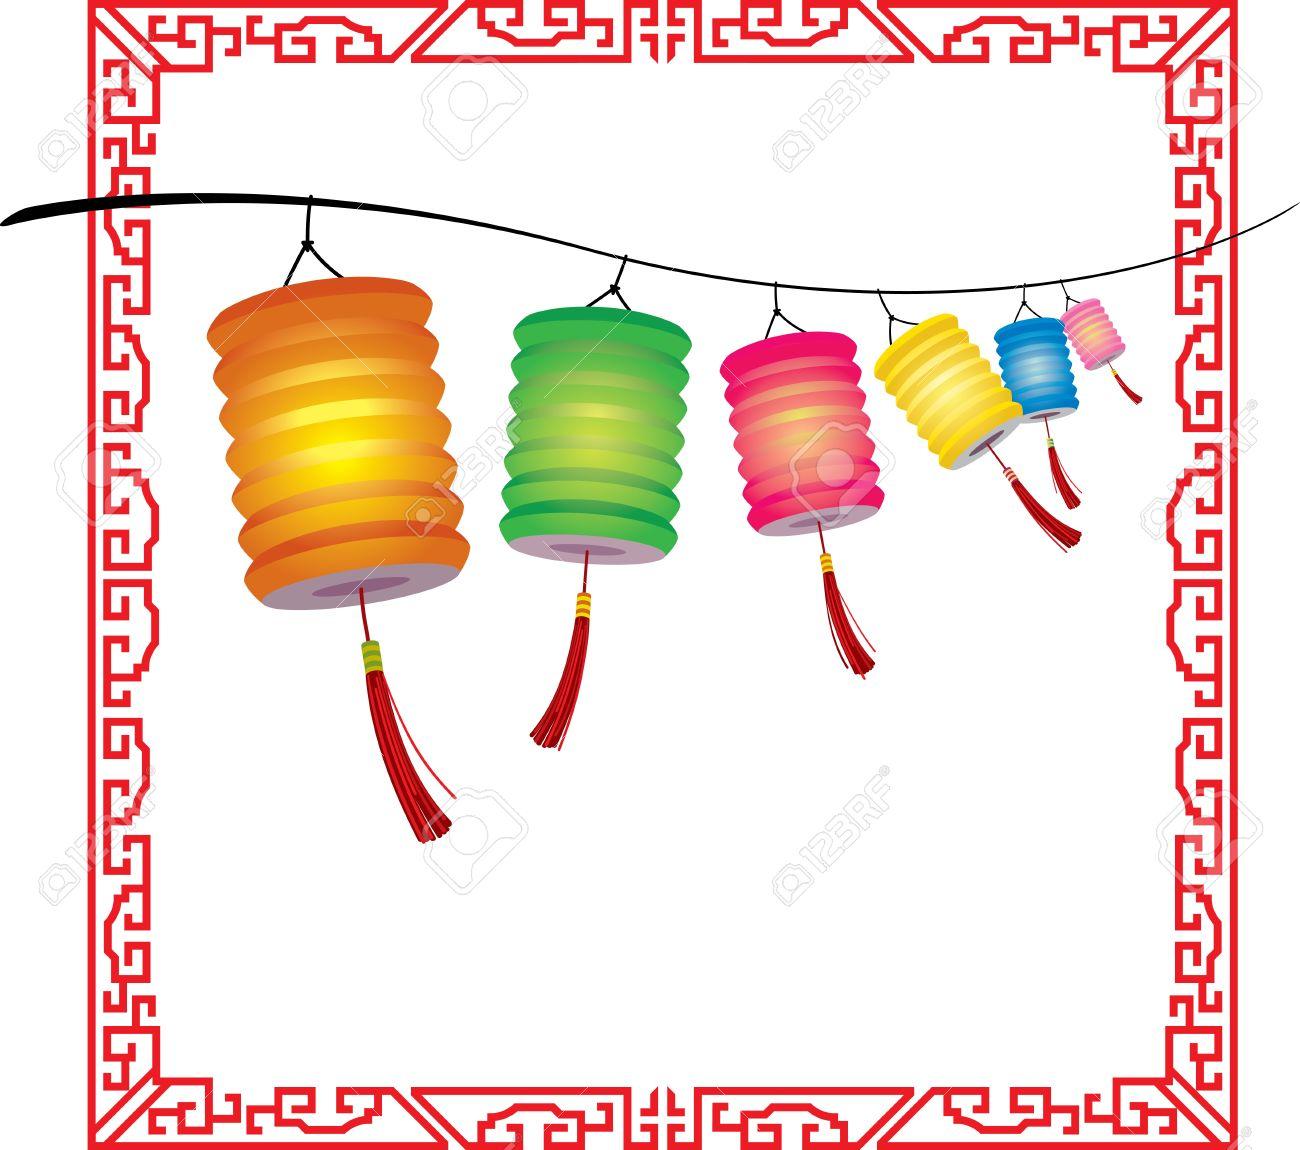 Lantern festival clipart 20 free Cliparts | Download ...